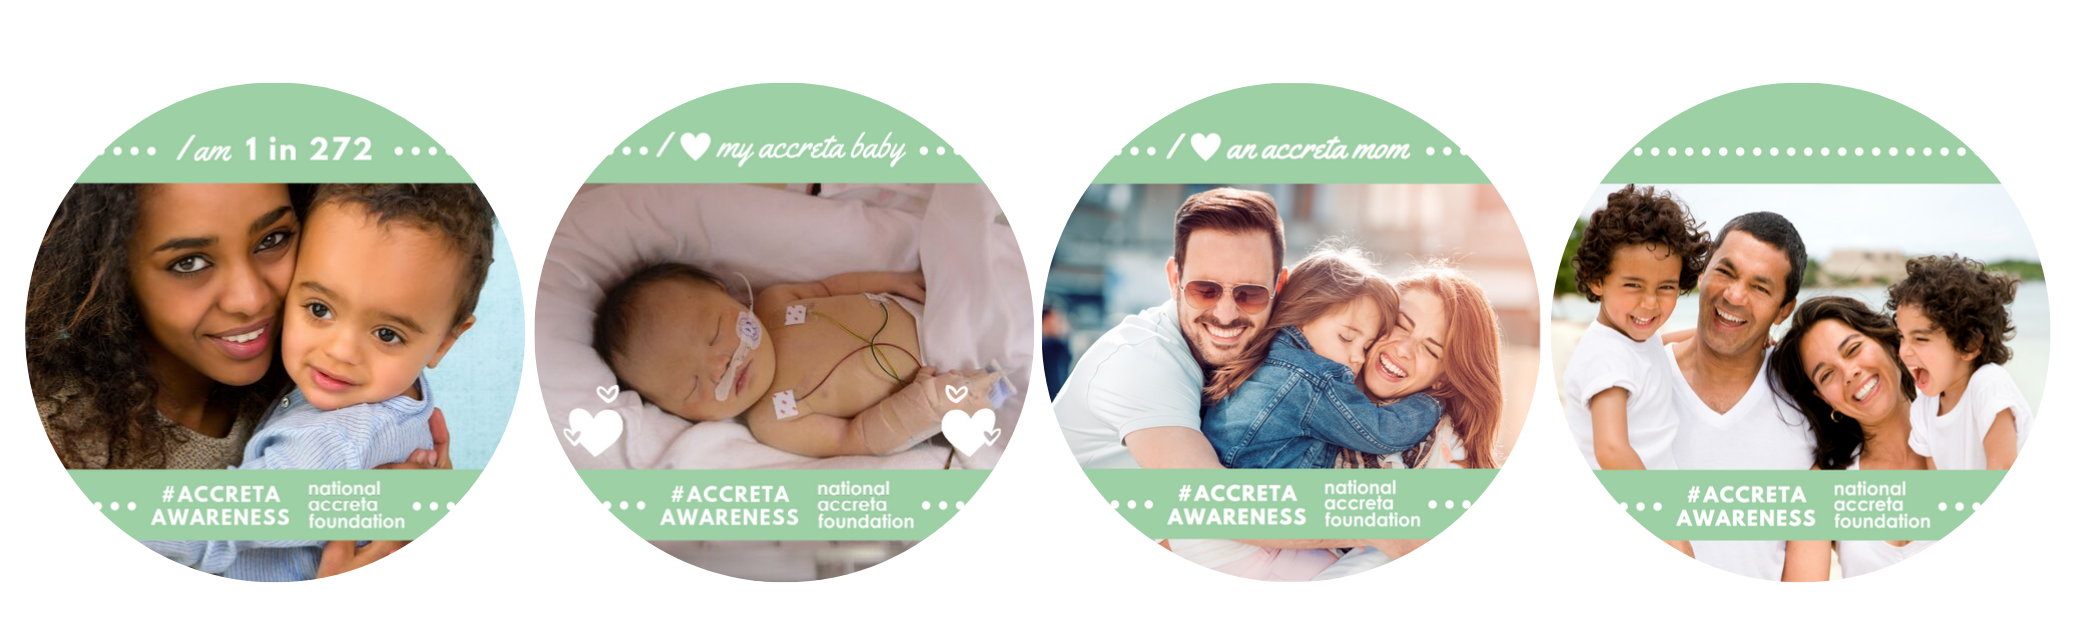 Accreta Awareness Month Facebook Profile Frames.png